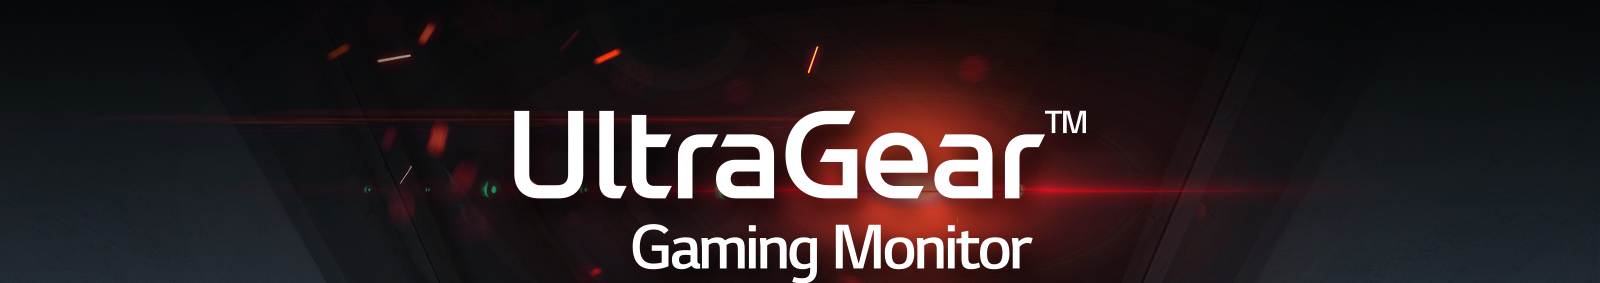 LG 27GL850 27'' UltraGear™ Nano IPS 1ms Gaming Monitor